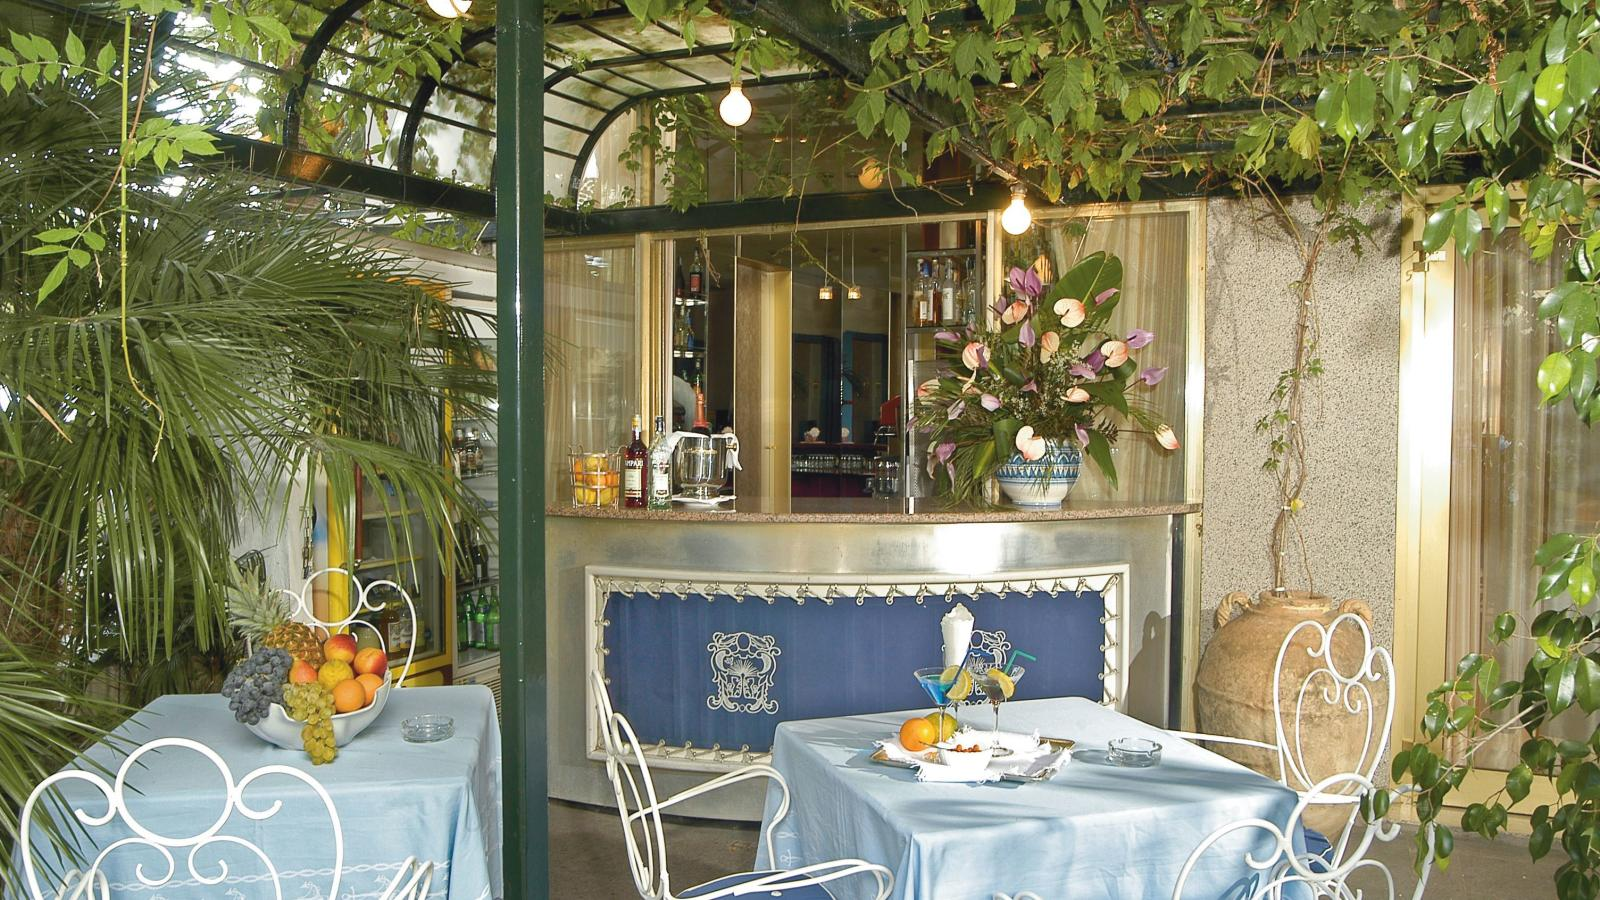 Reginna Palace Hotel Amalfi Coast